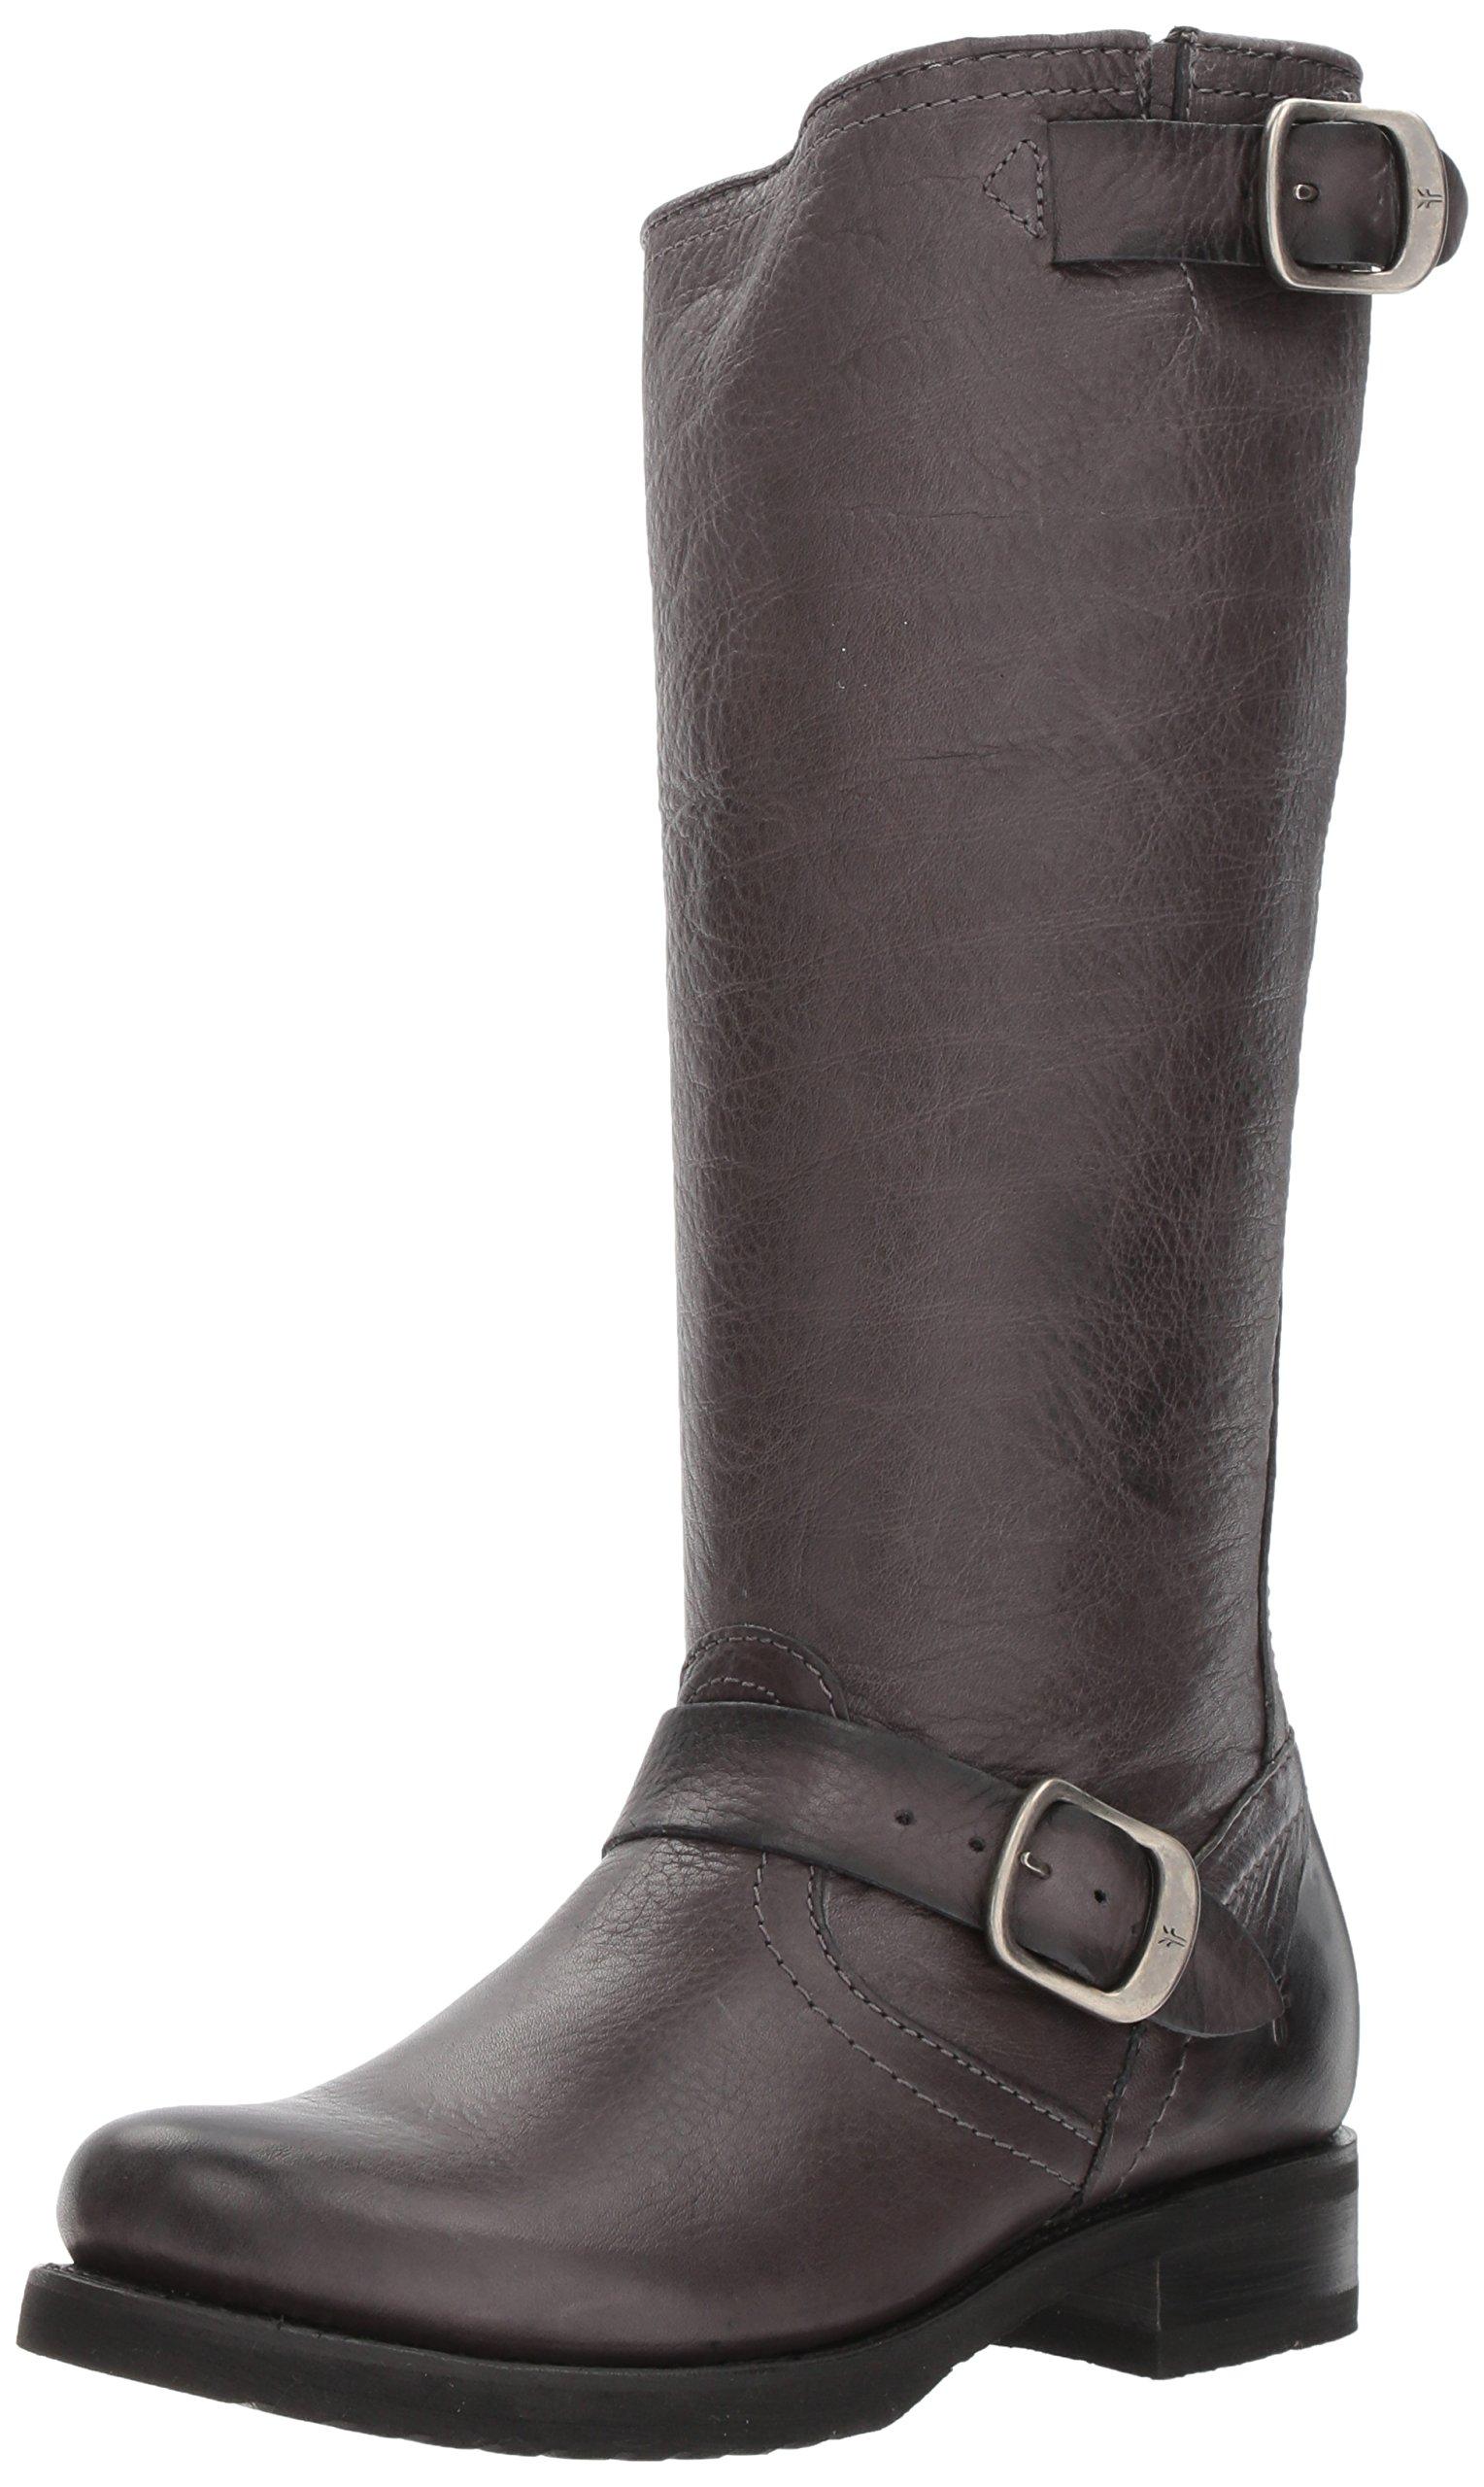 FRYE Women's Veronica 2 Slouch Boot, Smoke, 7.5 M US